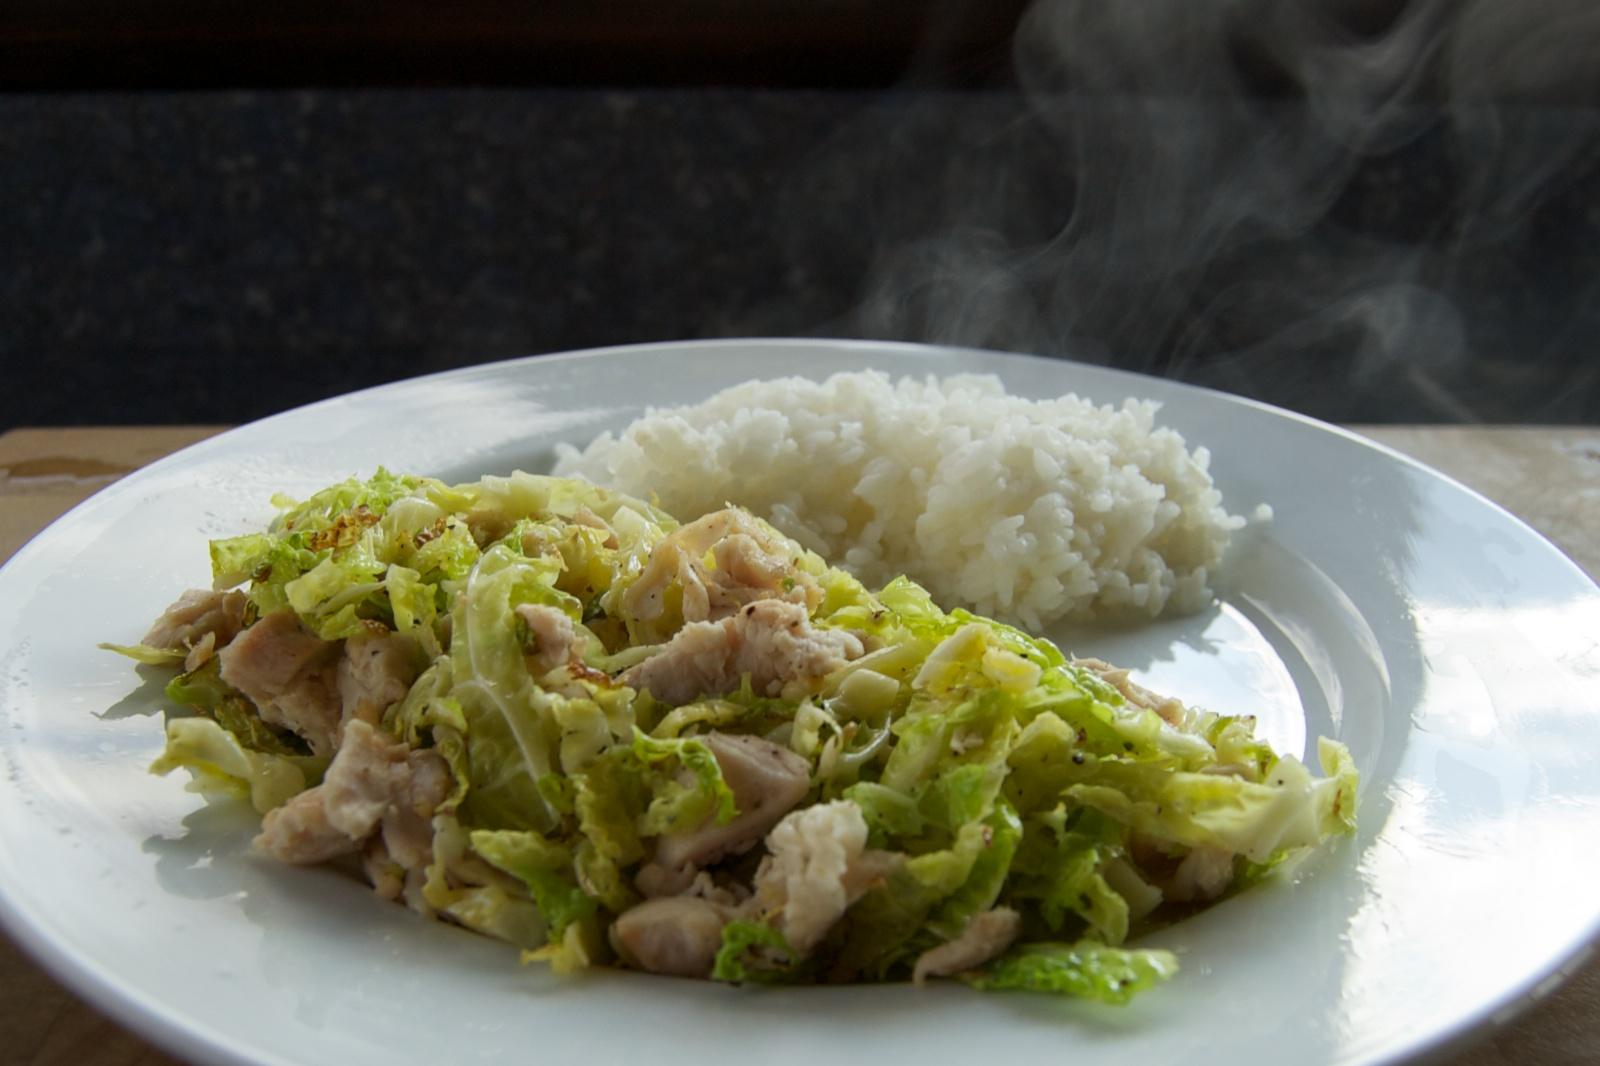 http://blog.rickk.com/food/2013/03/13/ate.2013.03.13.l.jpg